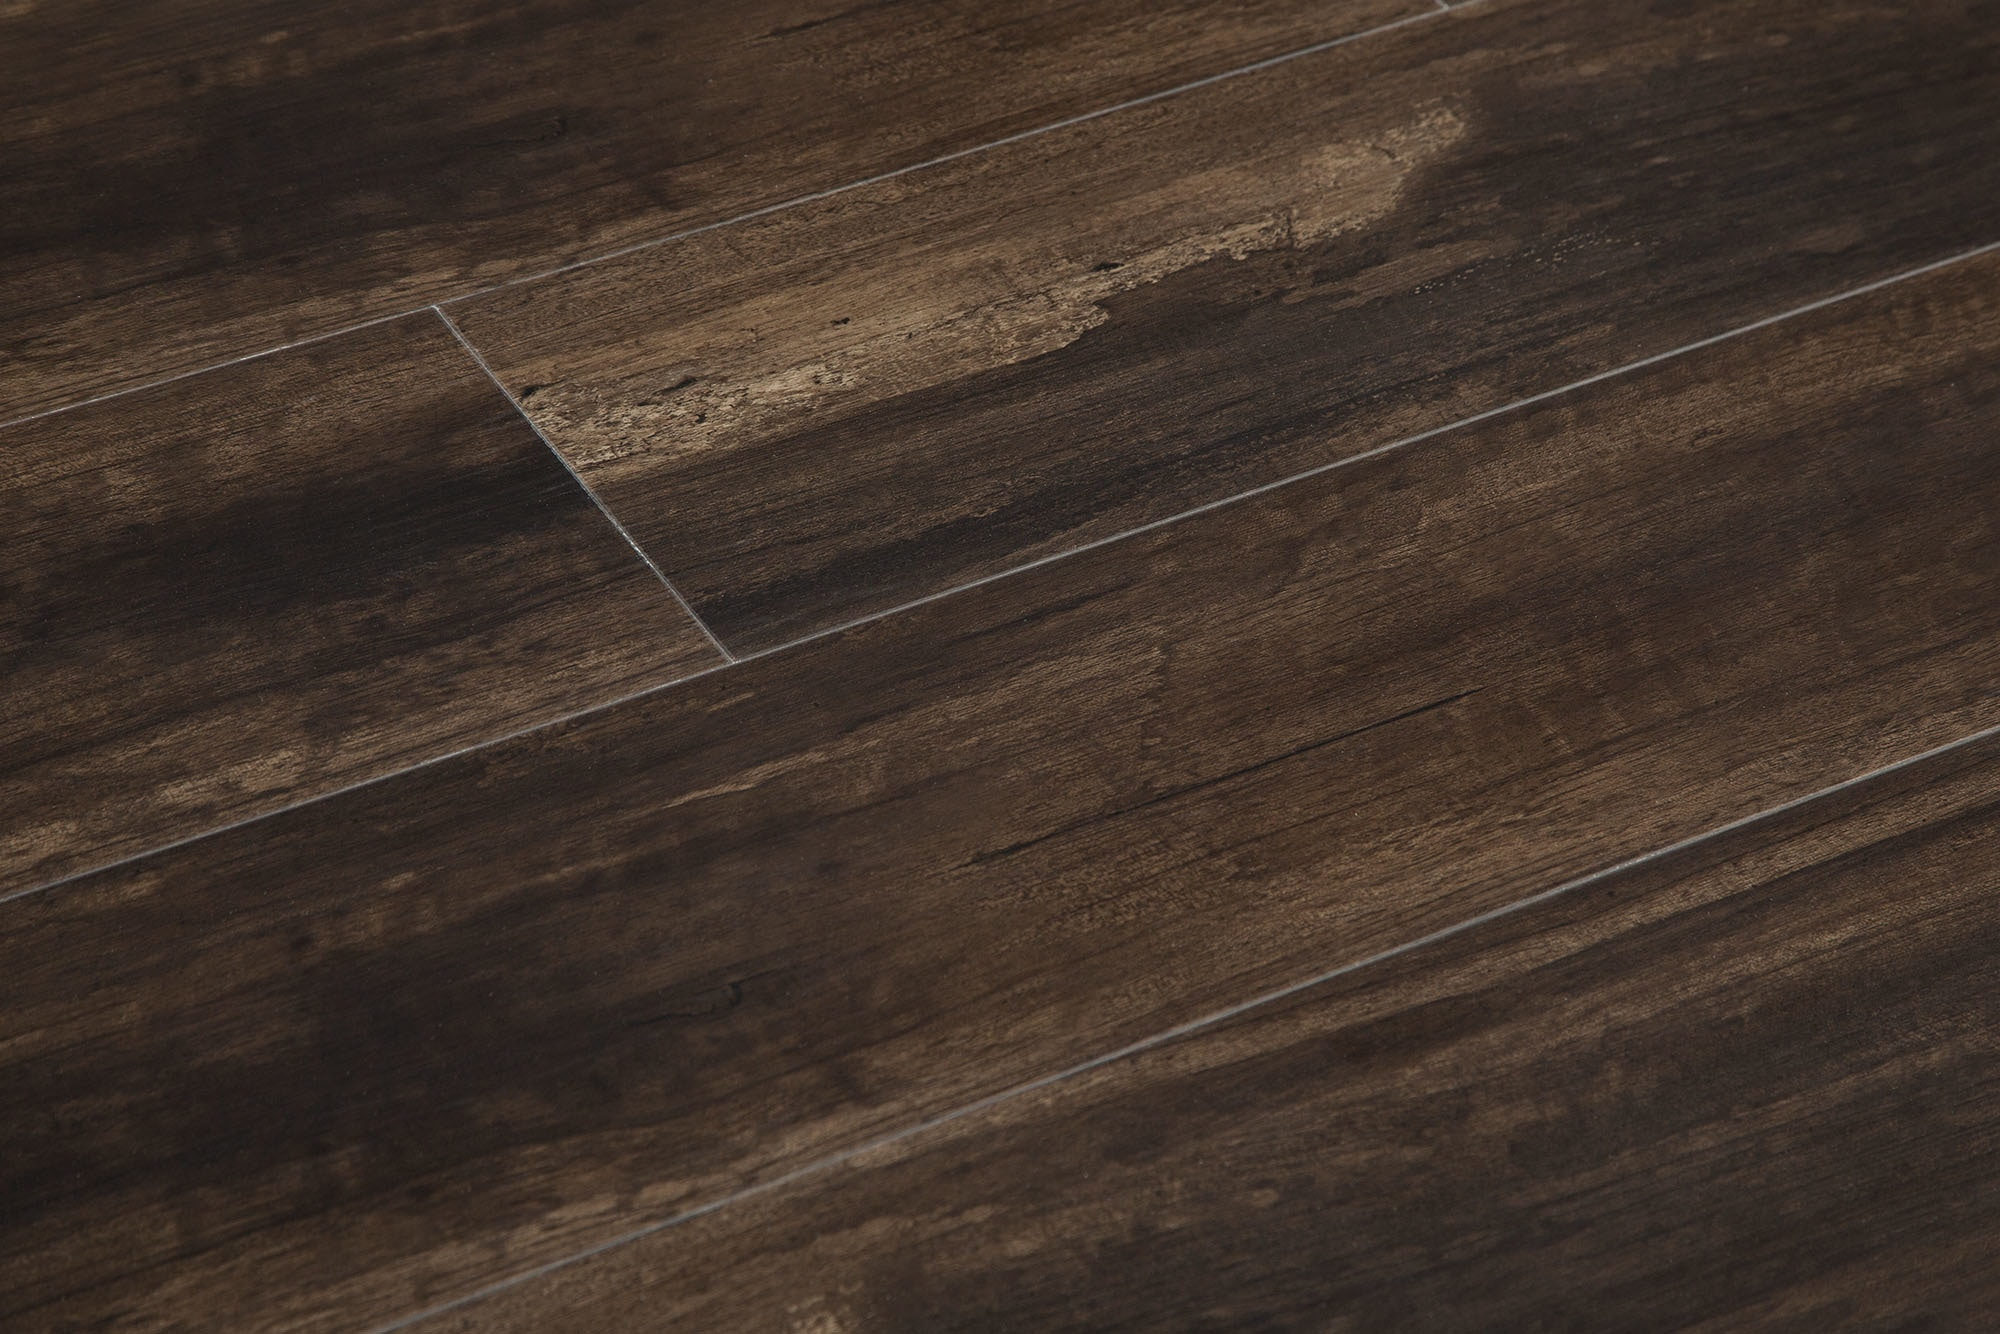 Sample Vesdura Vinyl Planks Influence Collection-Elm 5.5mm SPC Click Lock